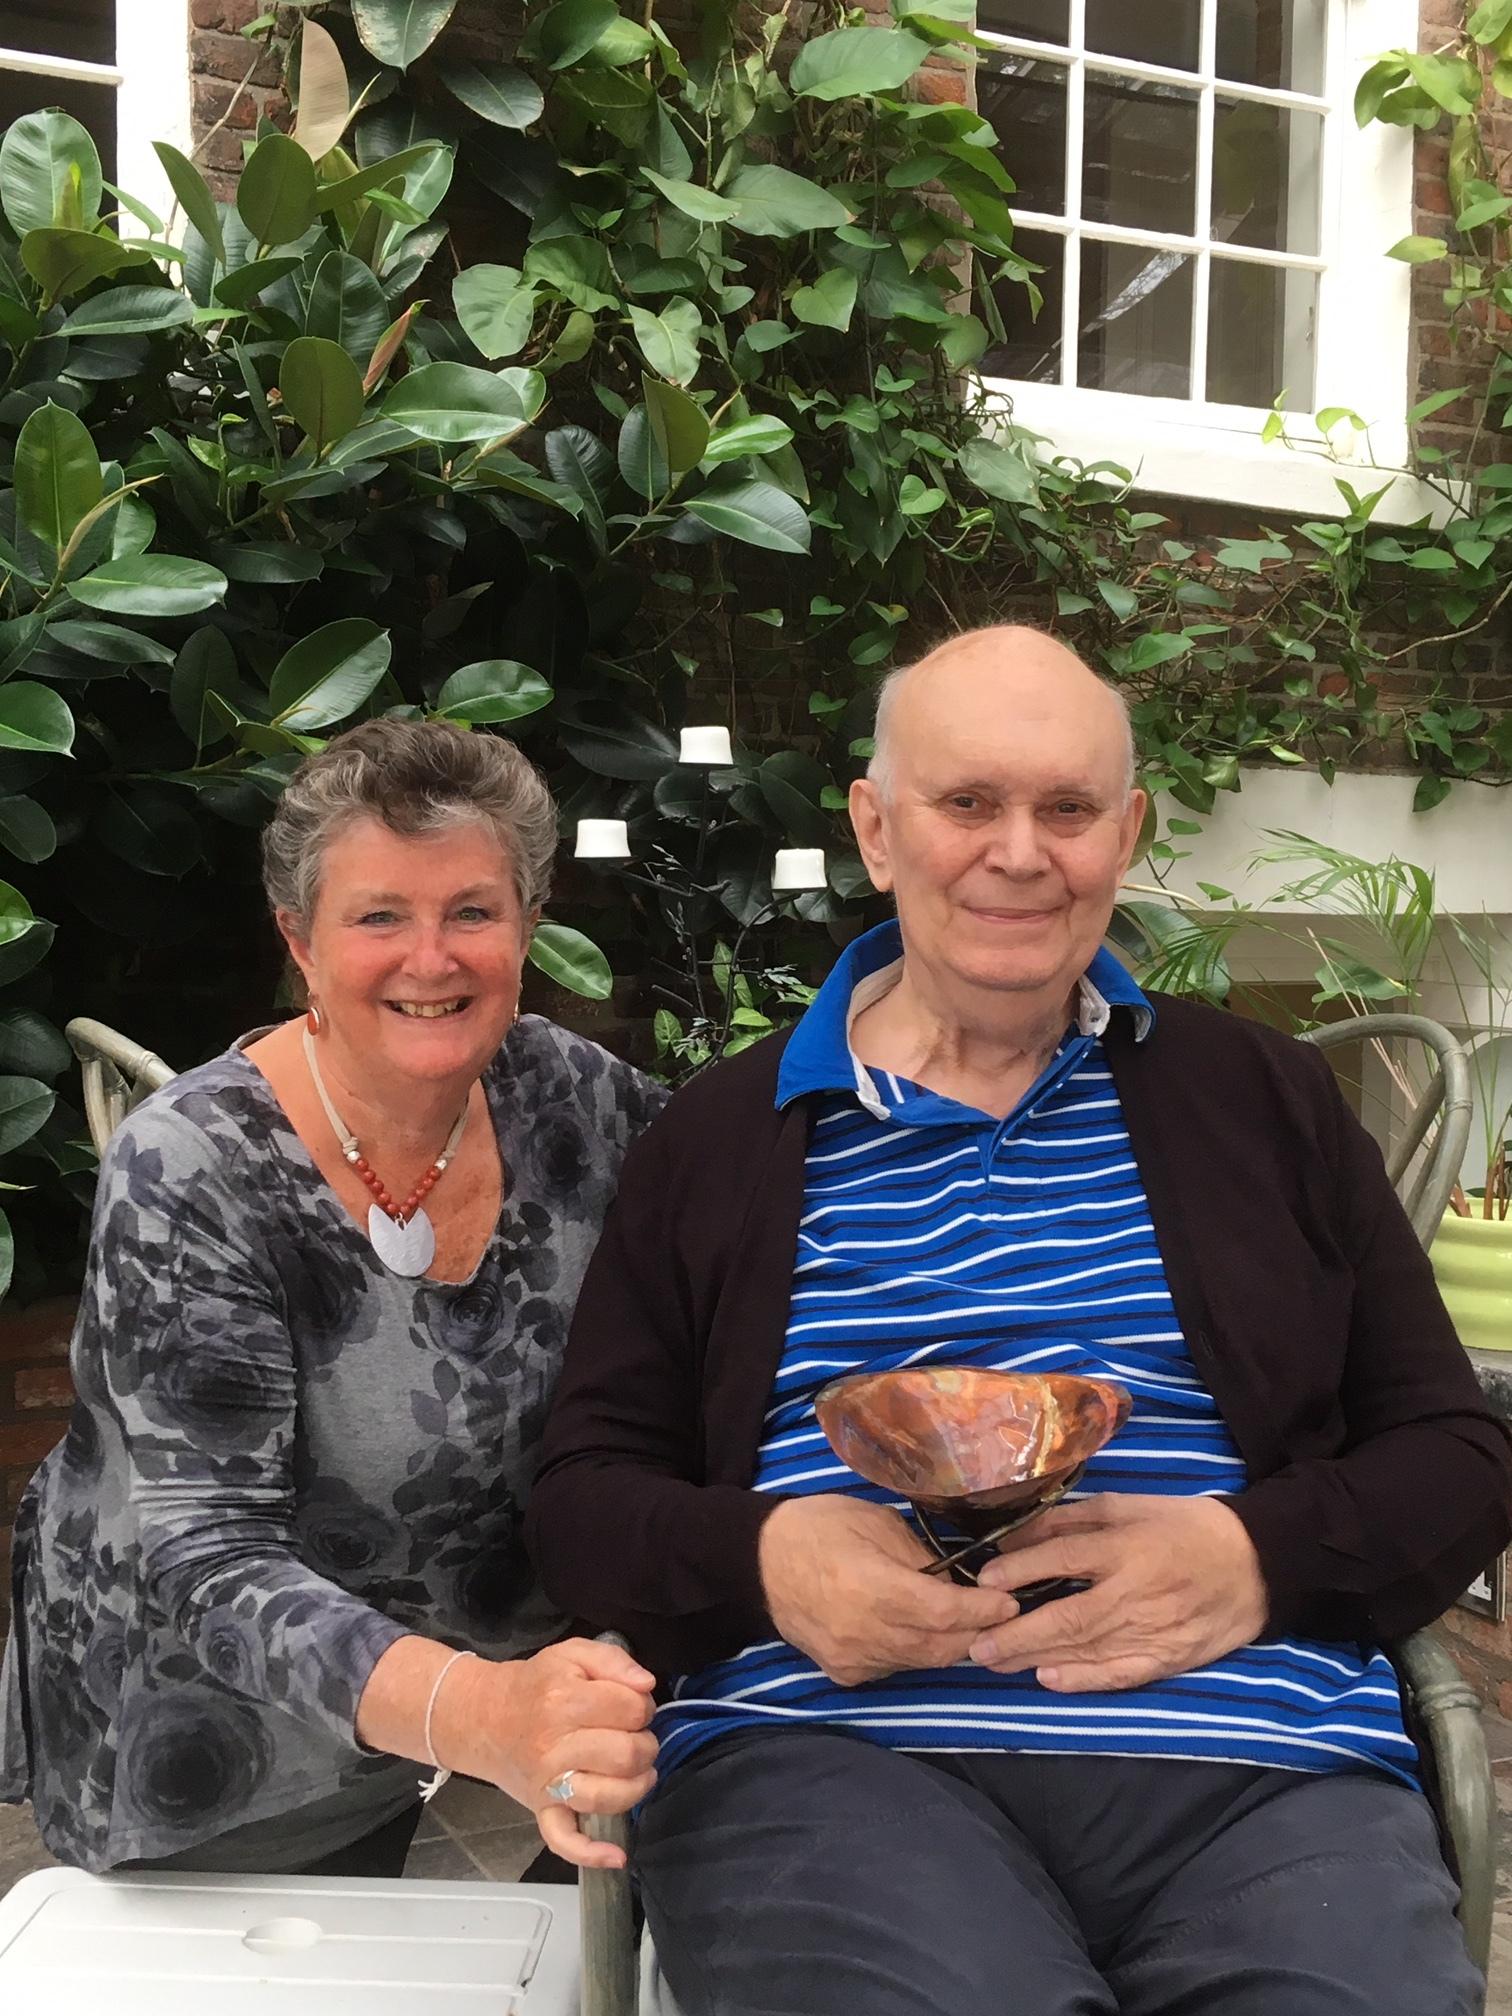 Ann Ellison with sir alan ayckbourn May 2019